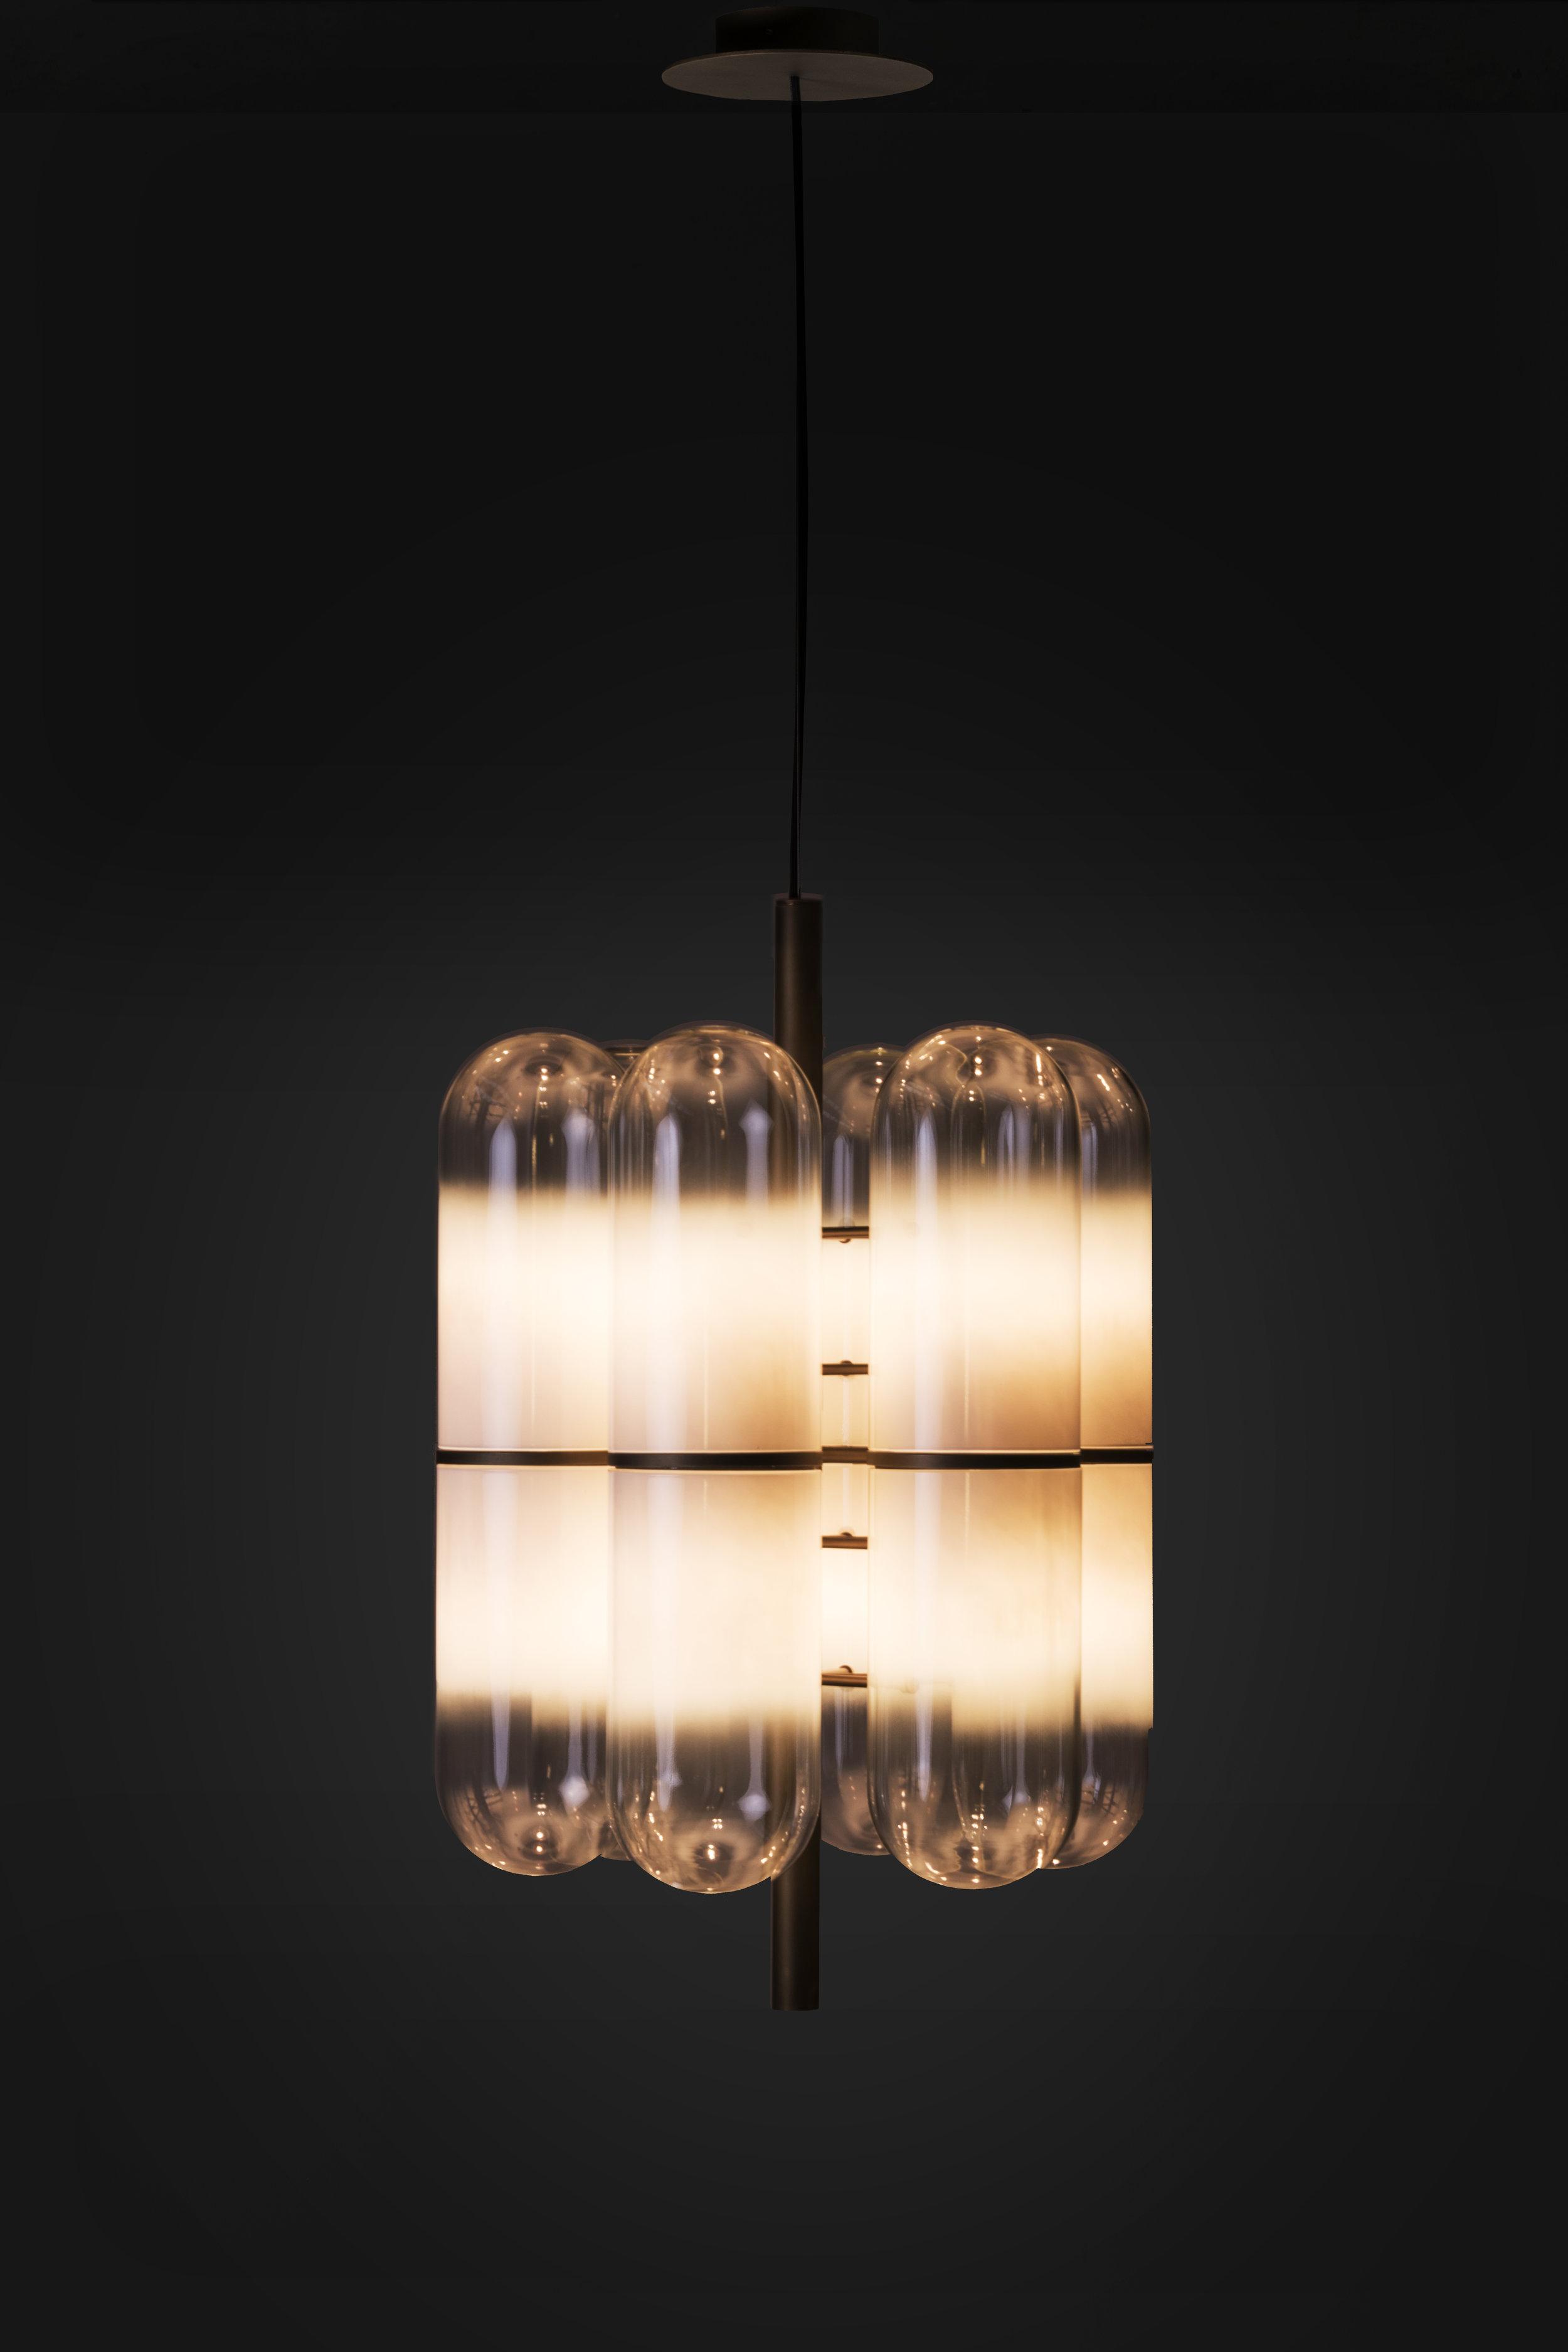 Federico Peri_Charlotte lamp M_Nilufar gallery_01©Daniele Iodice.jpg